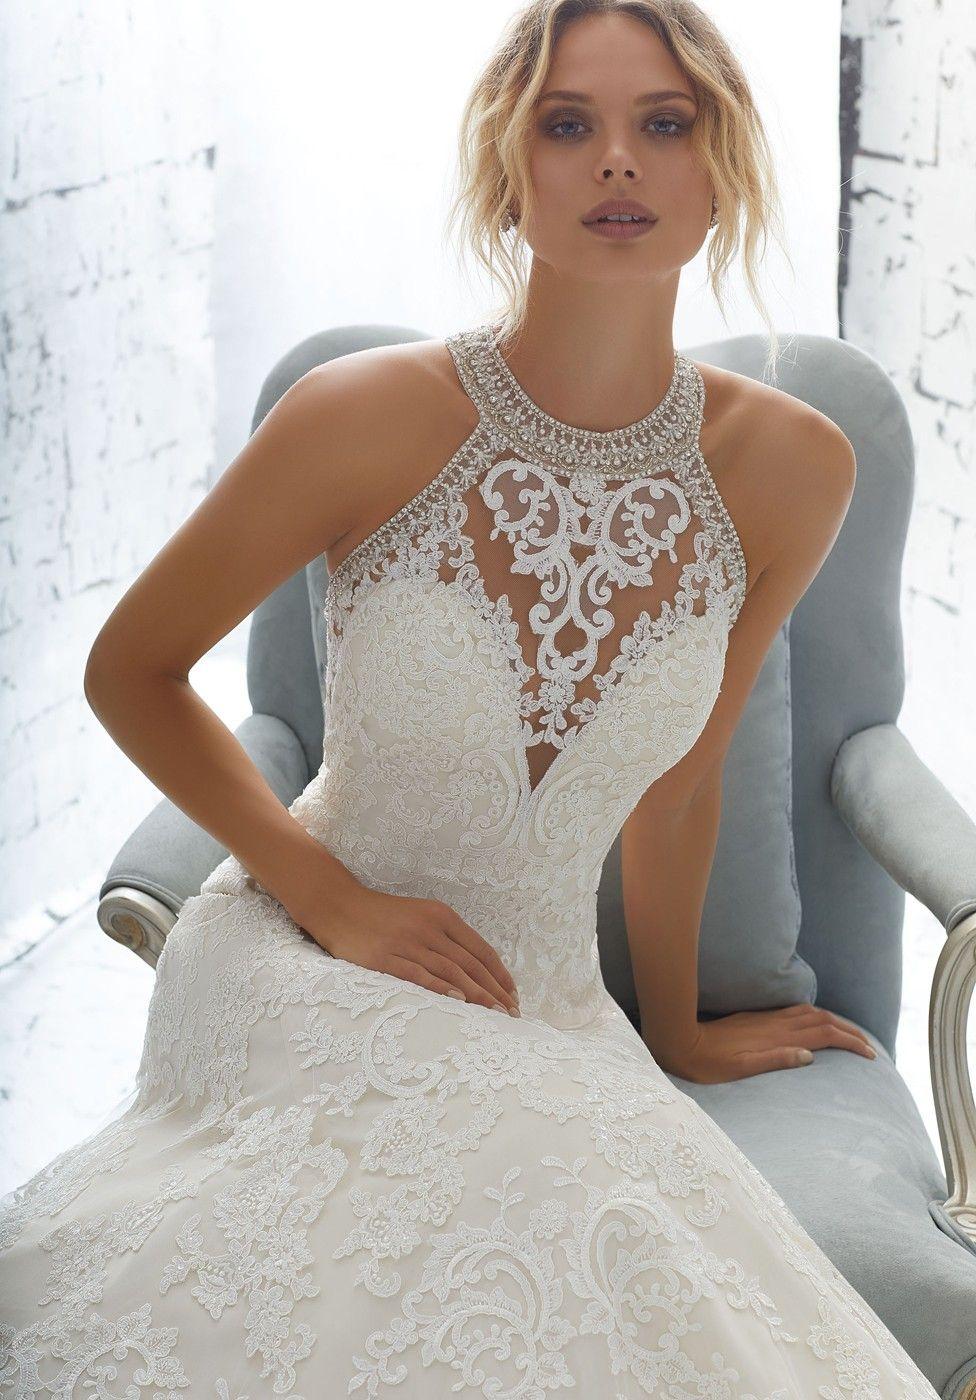 Best wedding dresses for 50 year olds  Mori Lee Angelina Faccenda  Kailani High Neck Bridal Dress